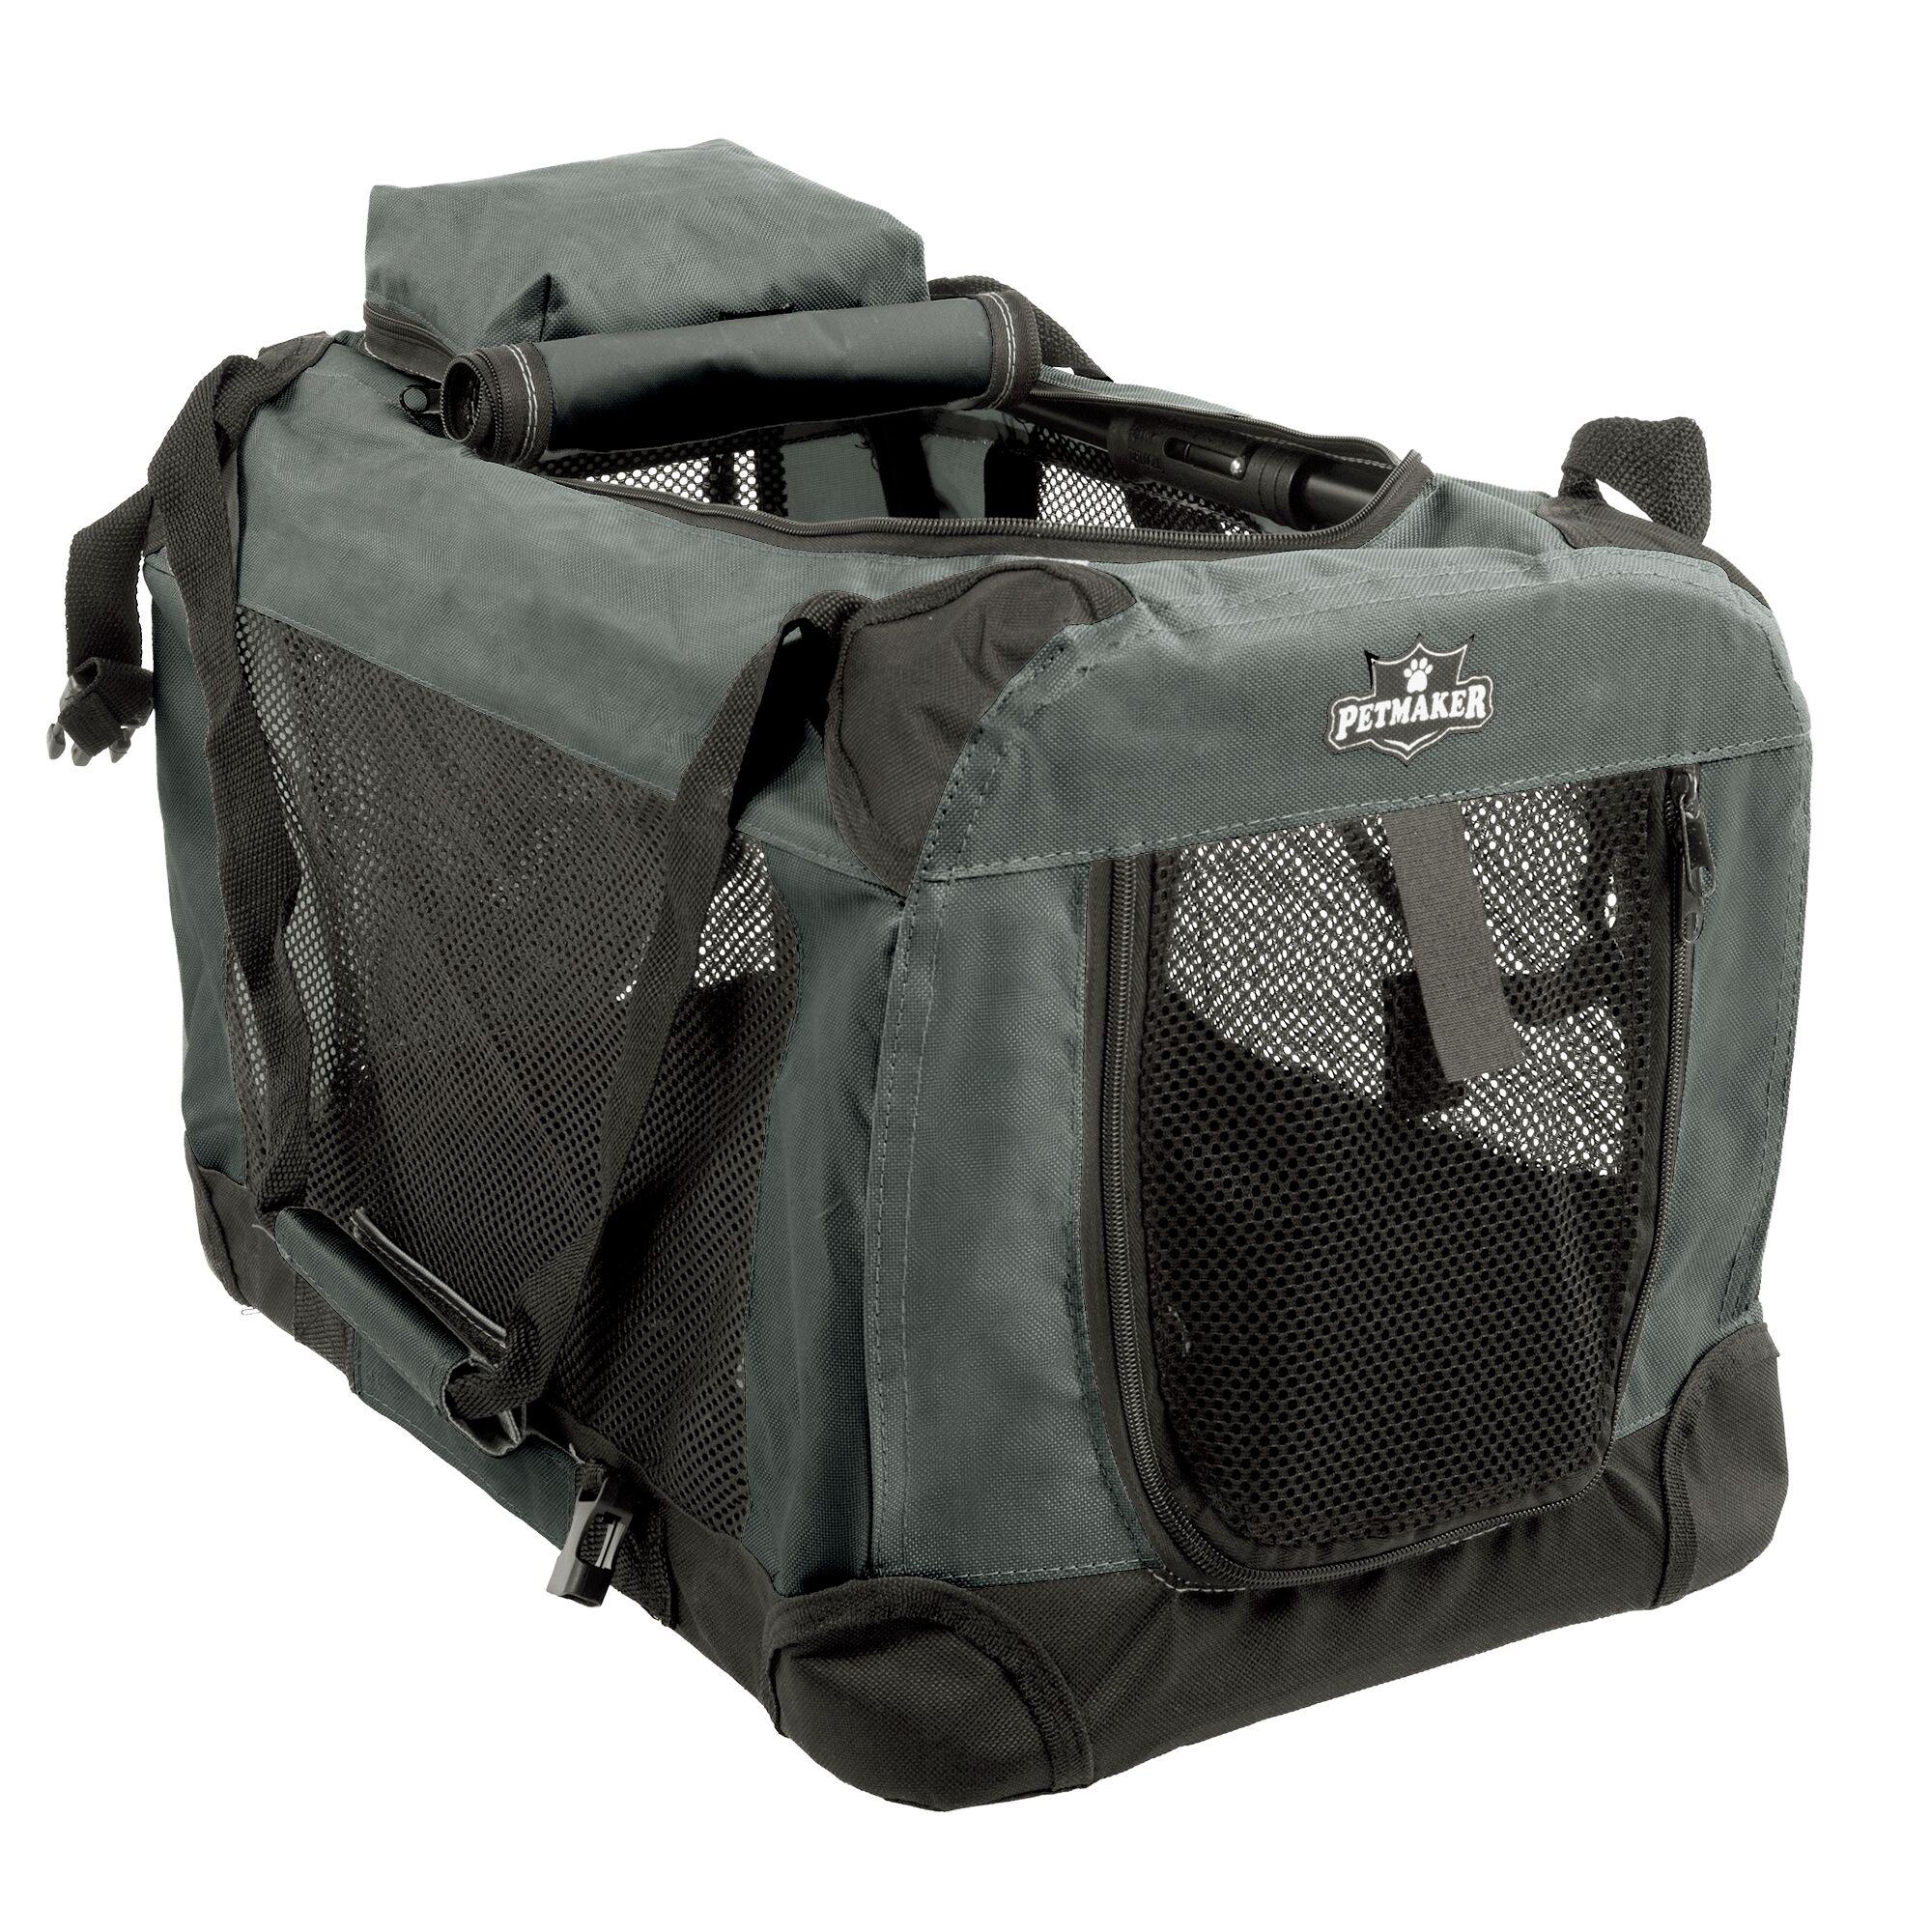 Soft Sided Pet Crate Color: Khaki, Size: 12.5